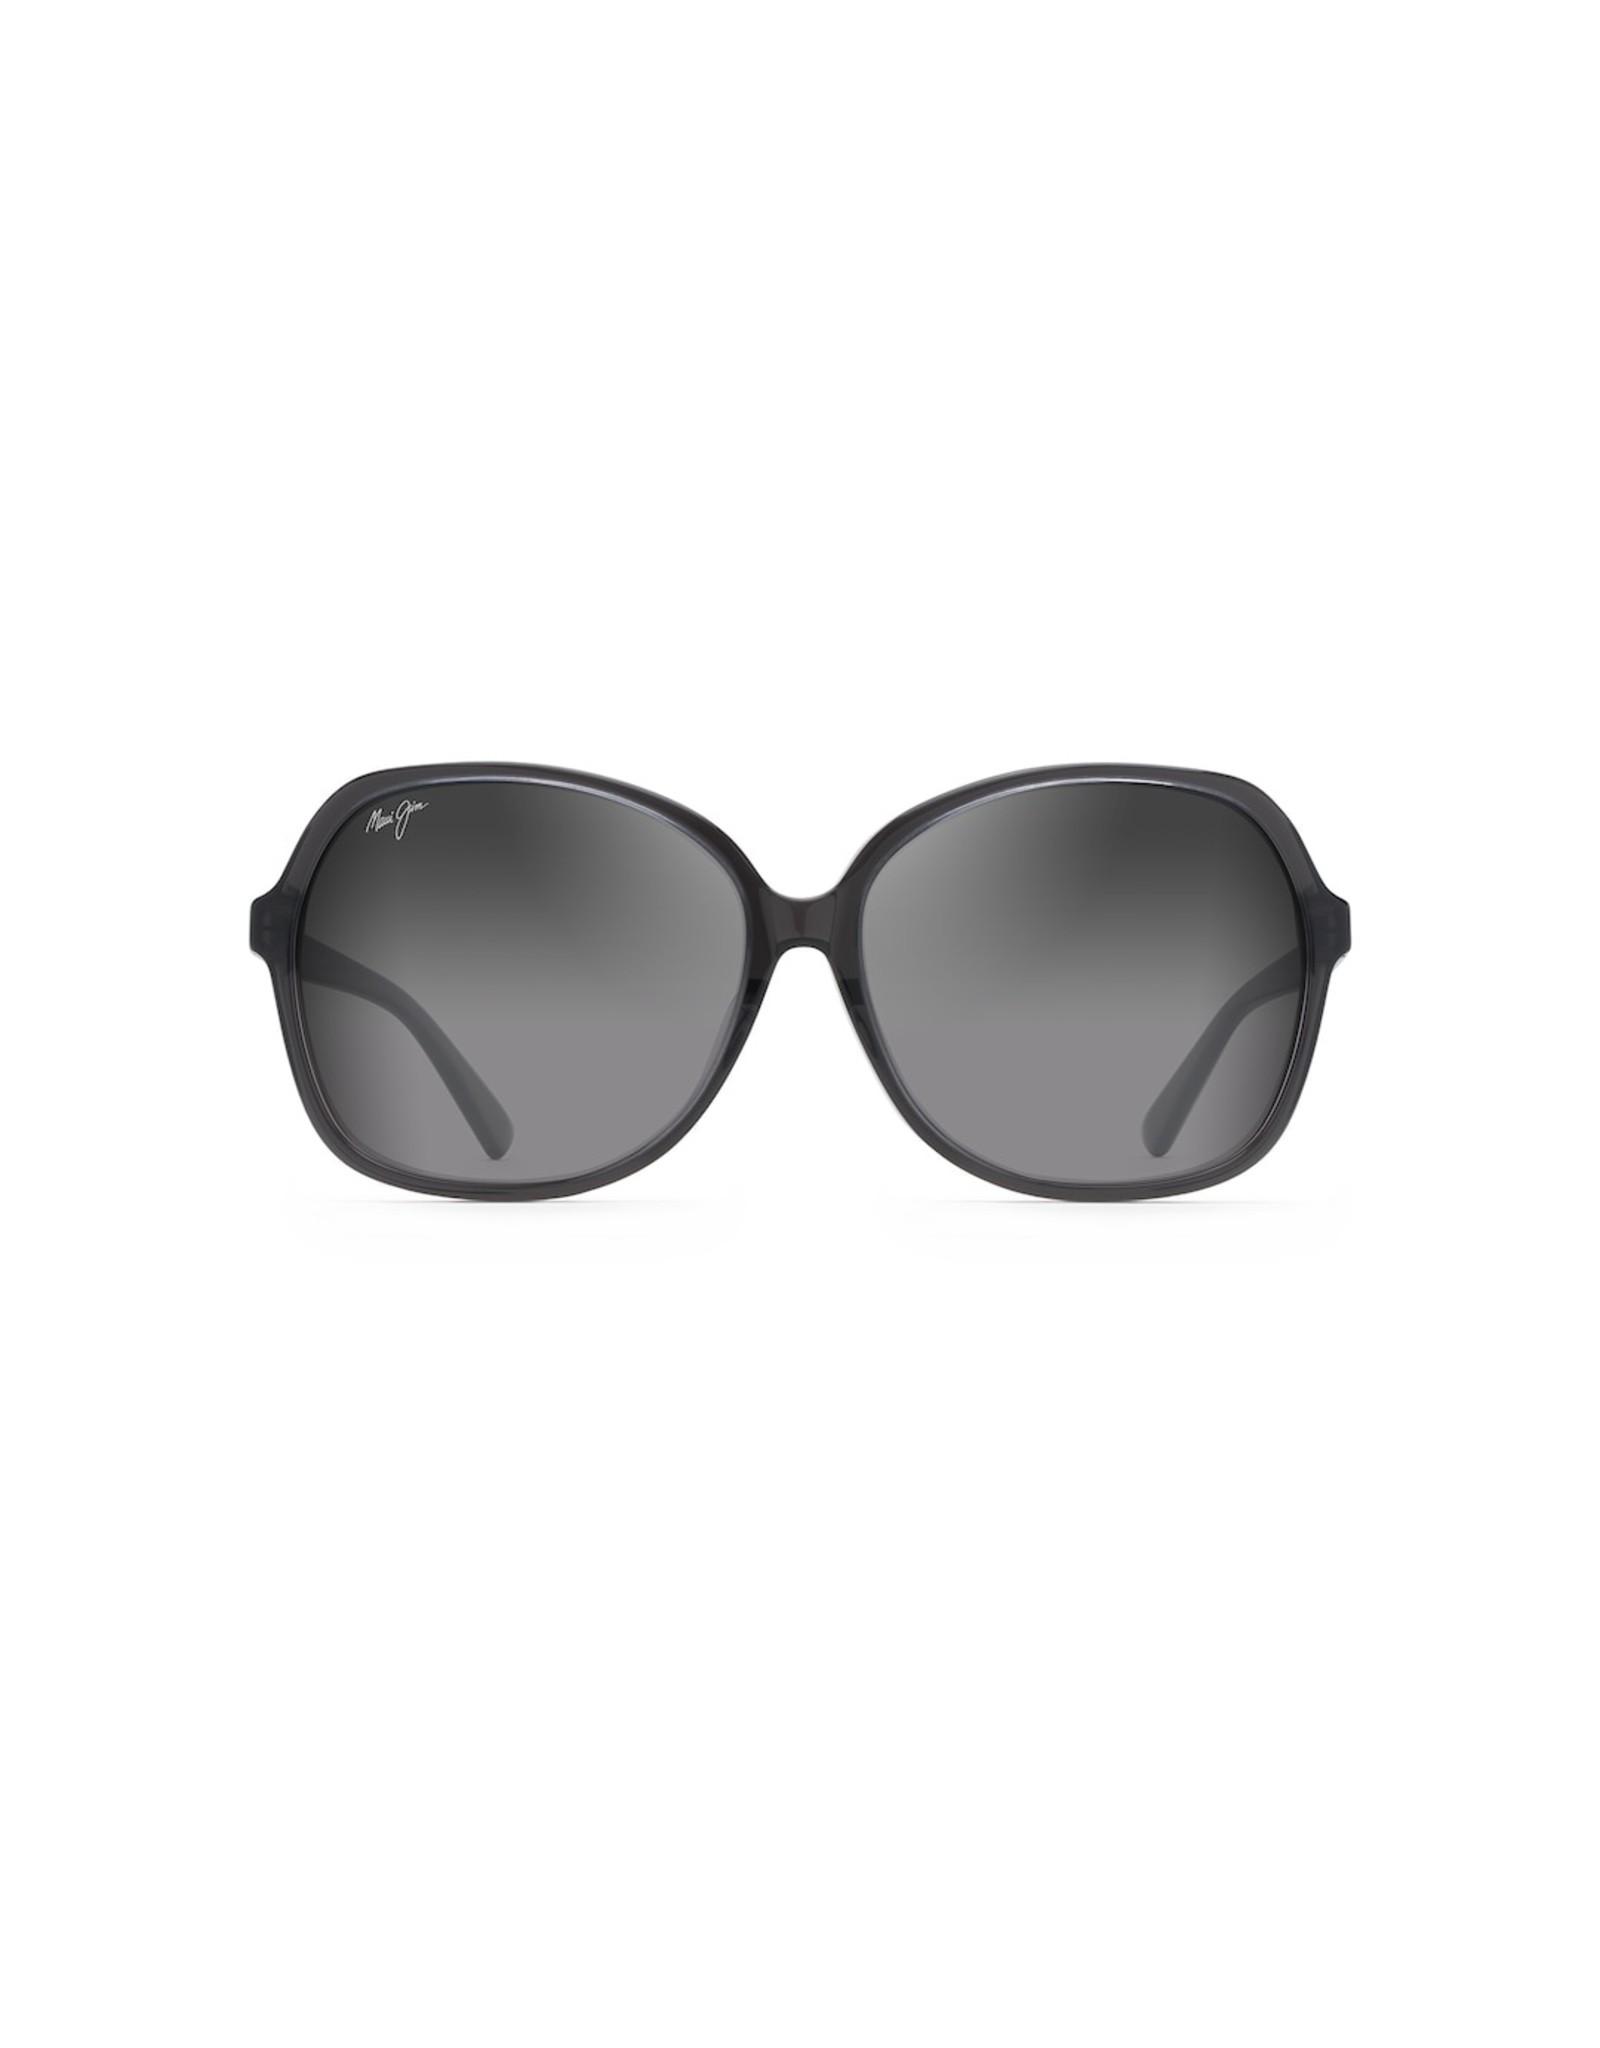 Maui Jim Maui Jim 'Taro Asian' Sunglasses